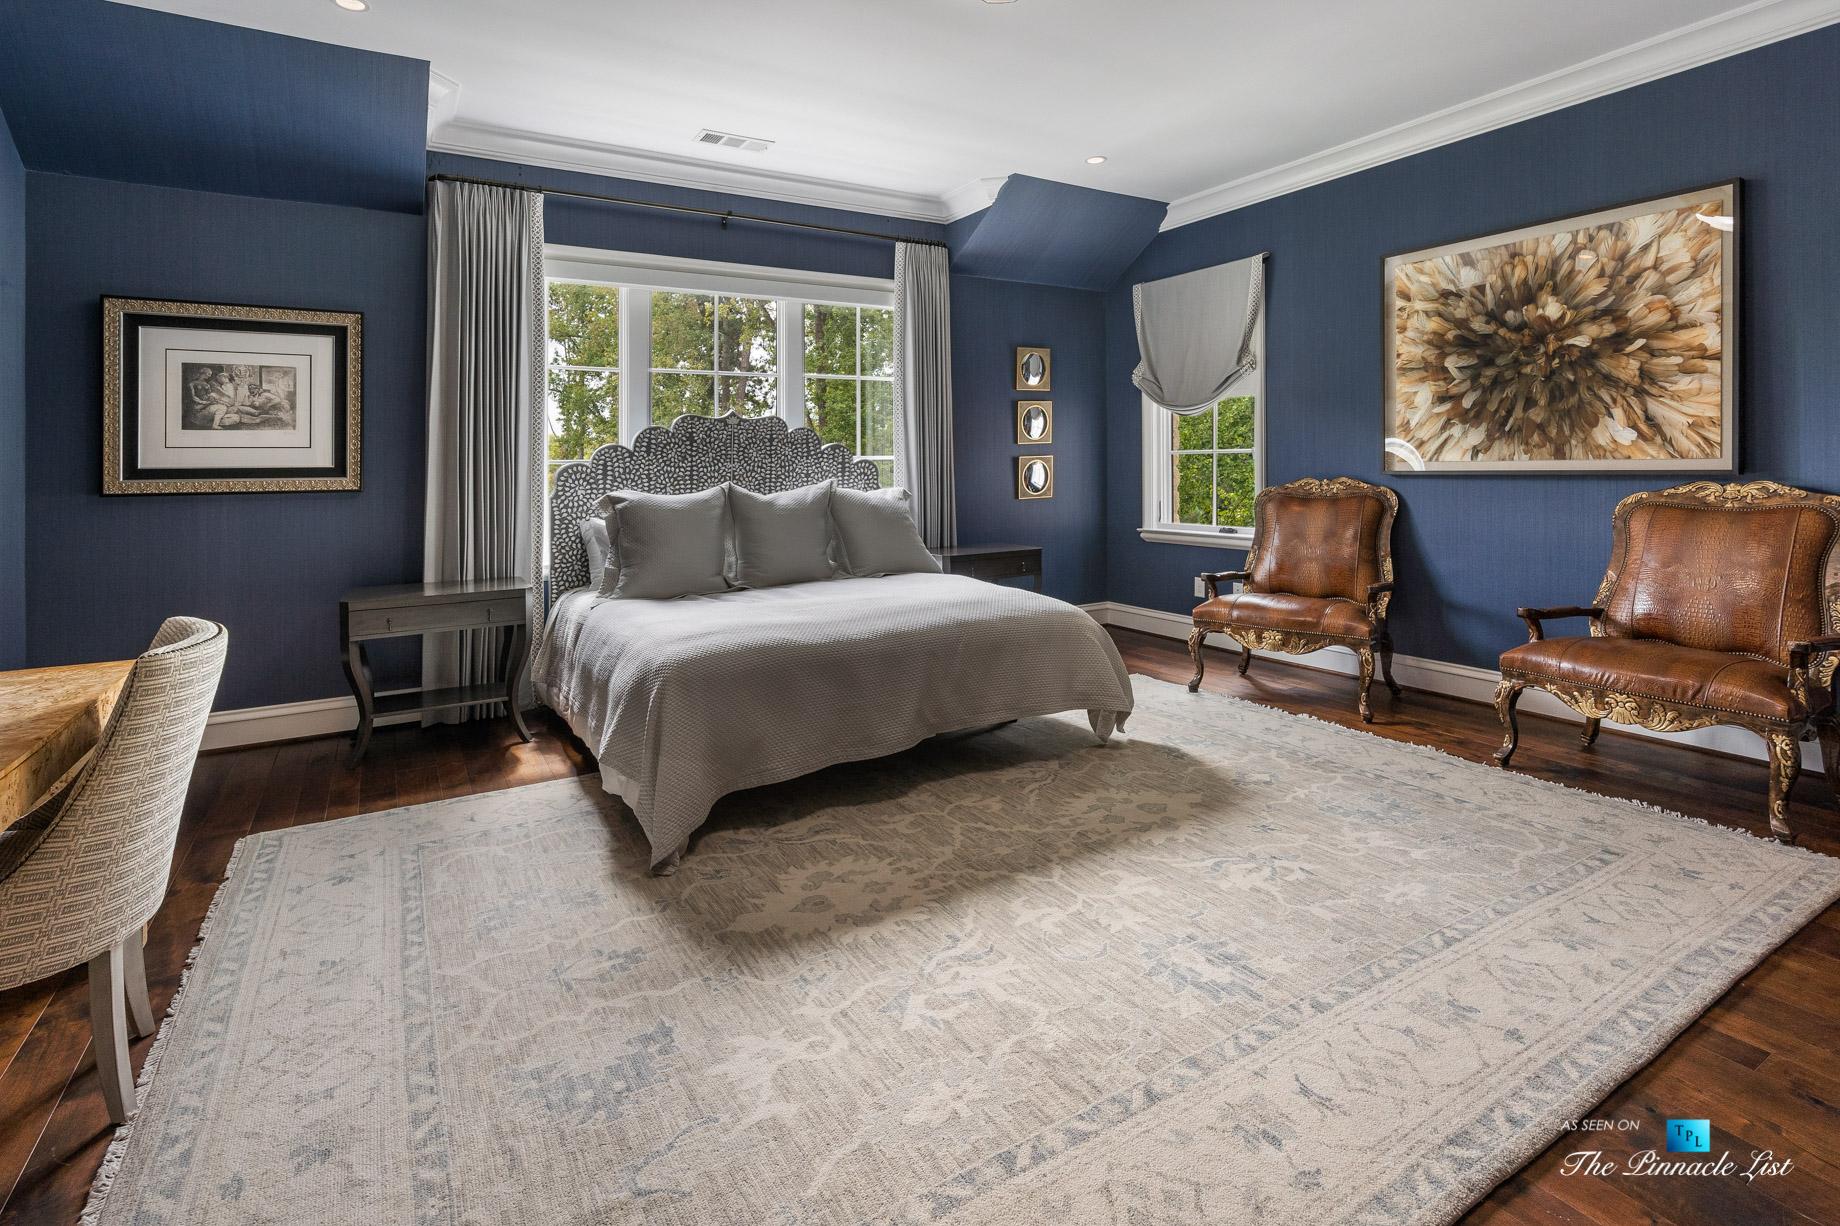 1150 W Garmon Rd, Atlanta, GA, USA - Bedroom - Luxury Real Estate - Buckhead Estate Home